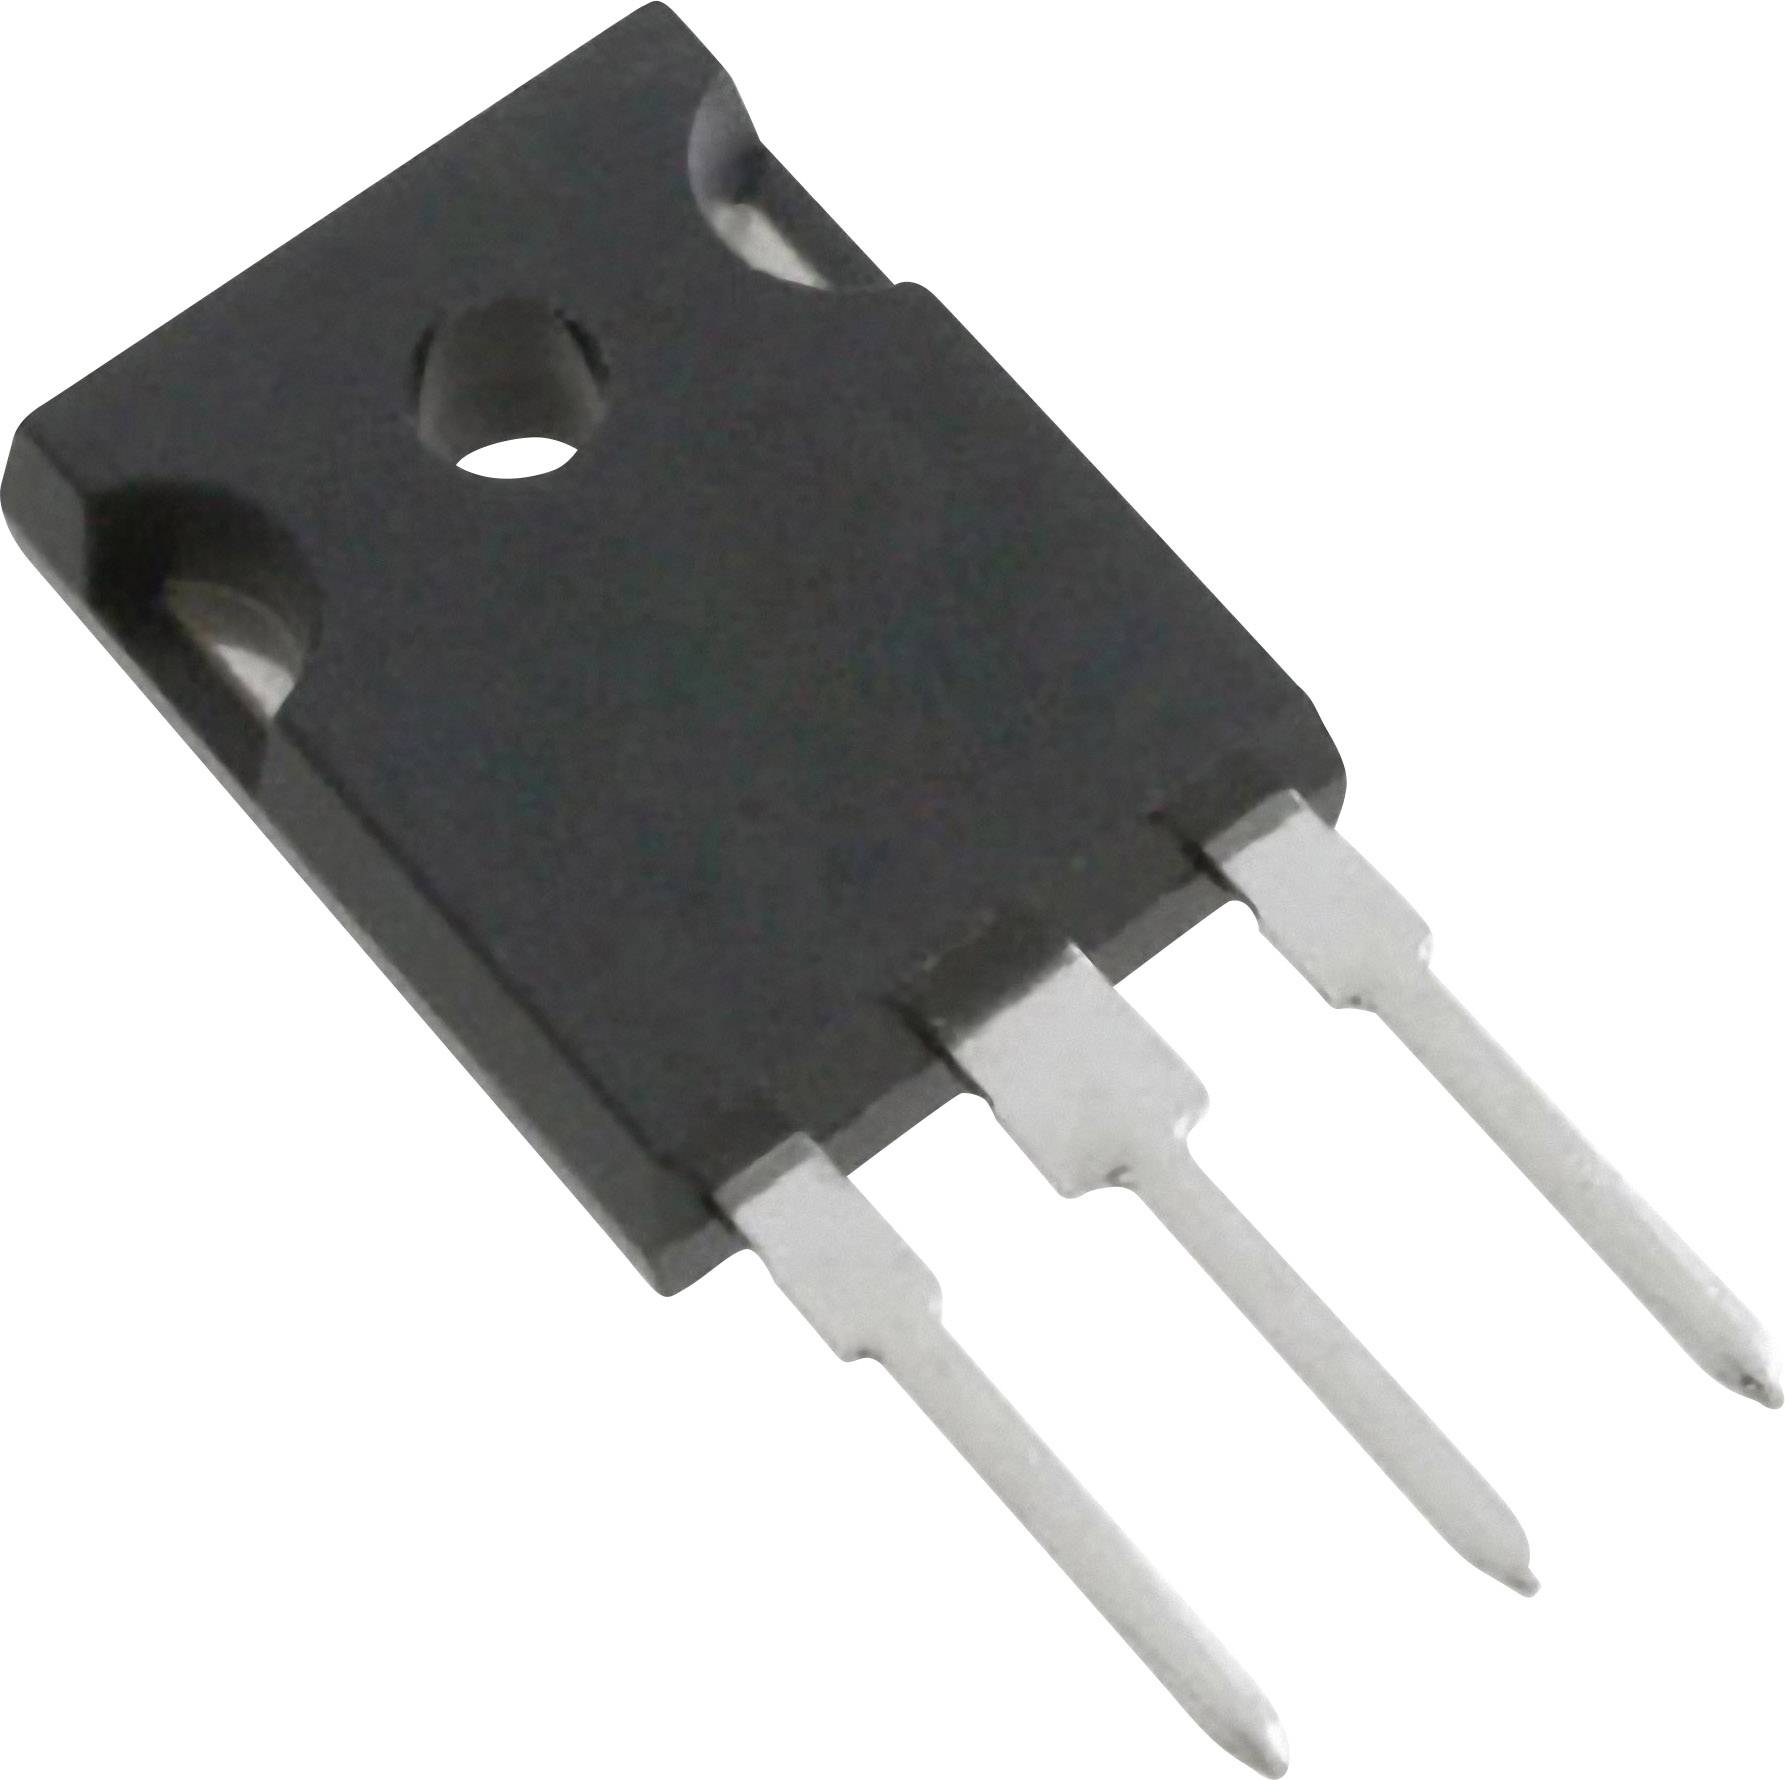 NPN tranzistor (BJT) - Single STMicroelectronics BUV48A, TO-247-3, Kanálov 1, 450 V